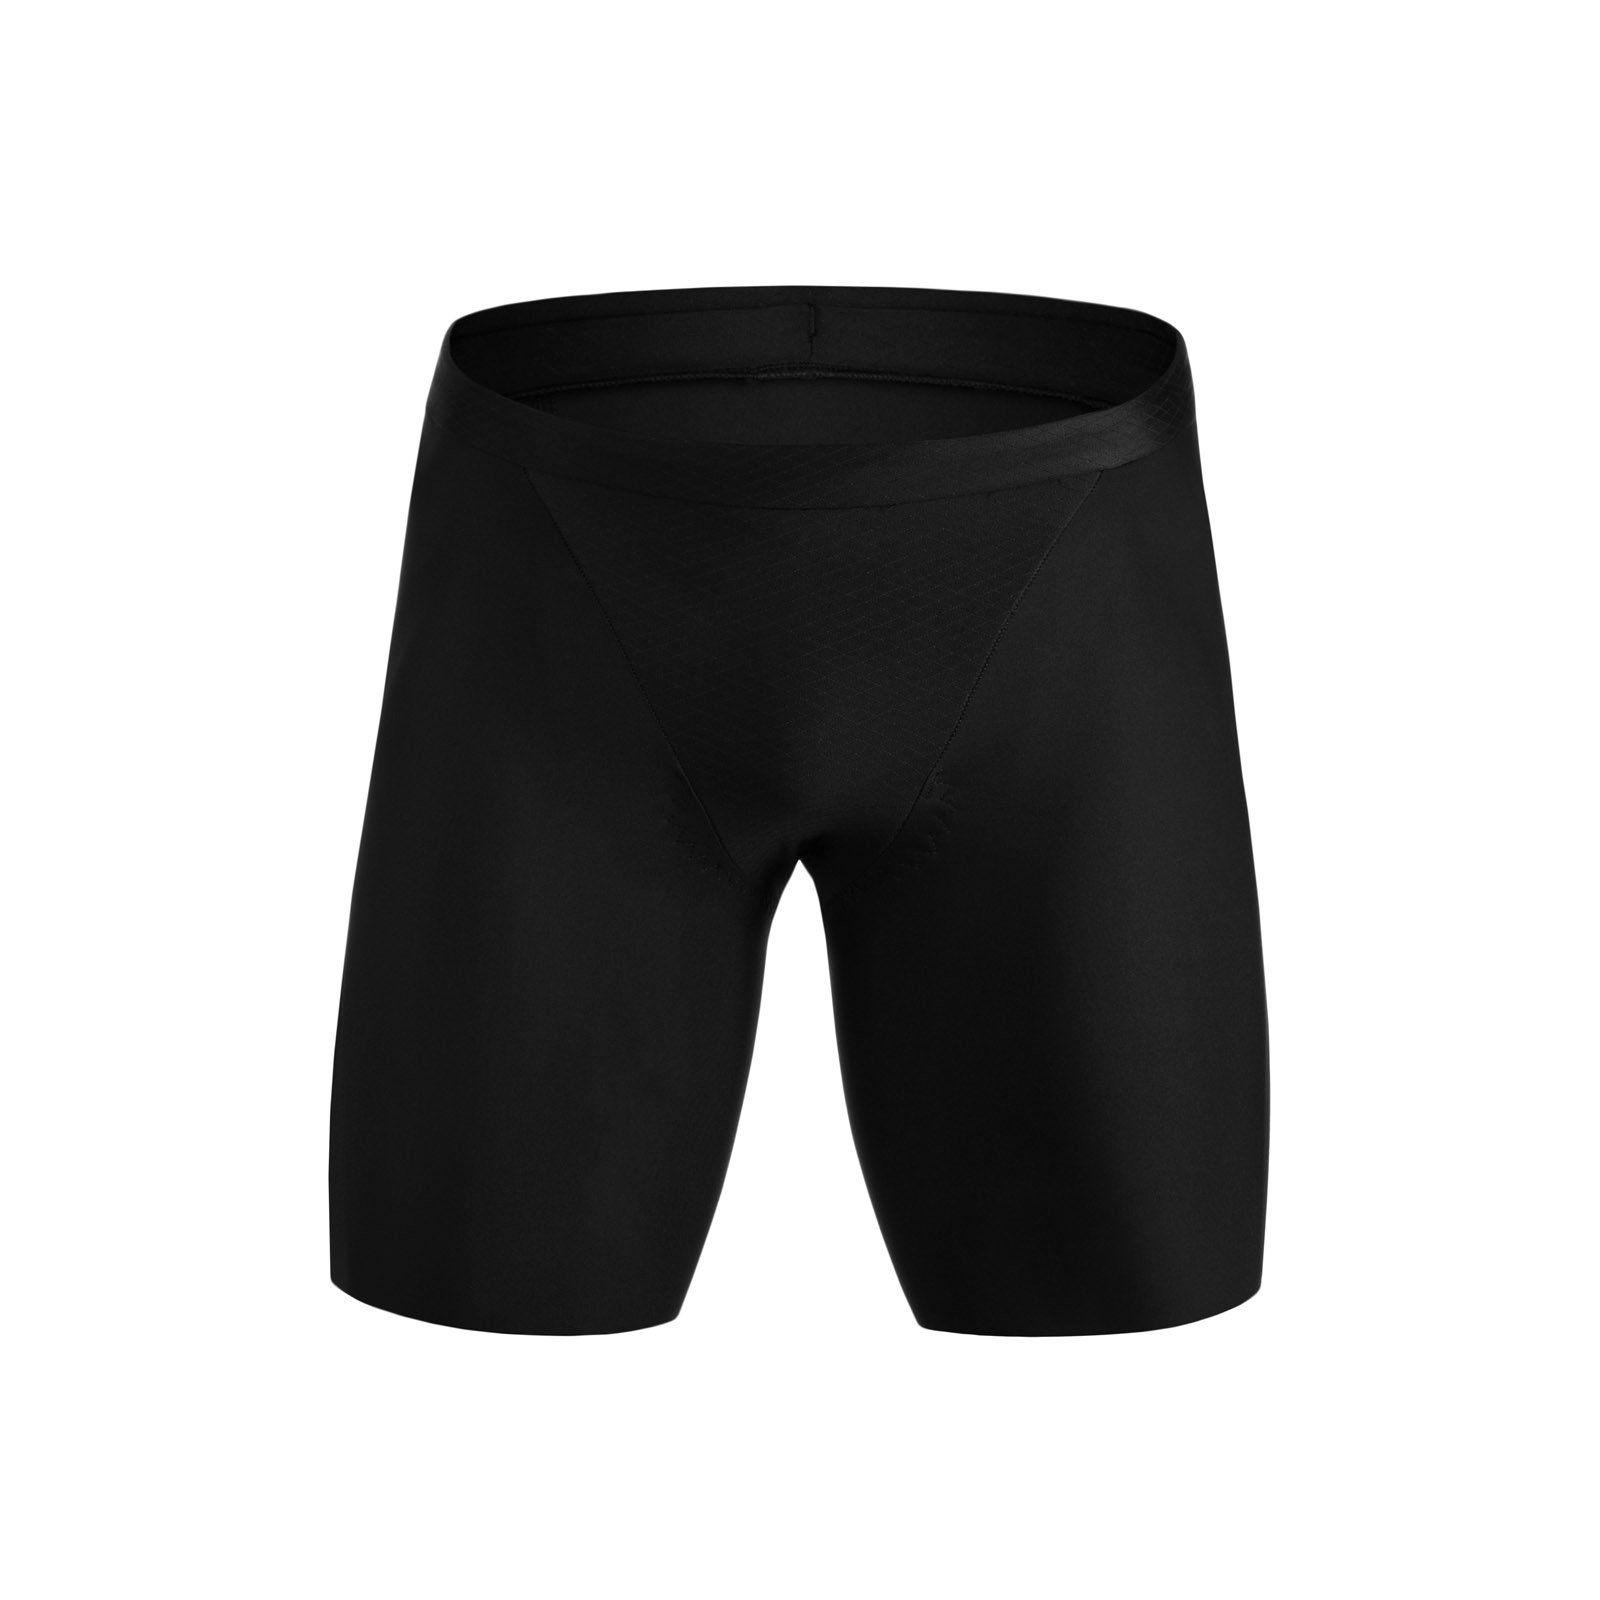 Roka Men's Tri Short